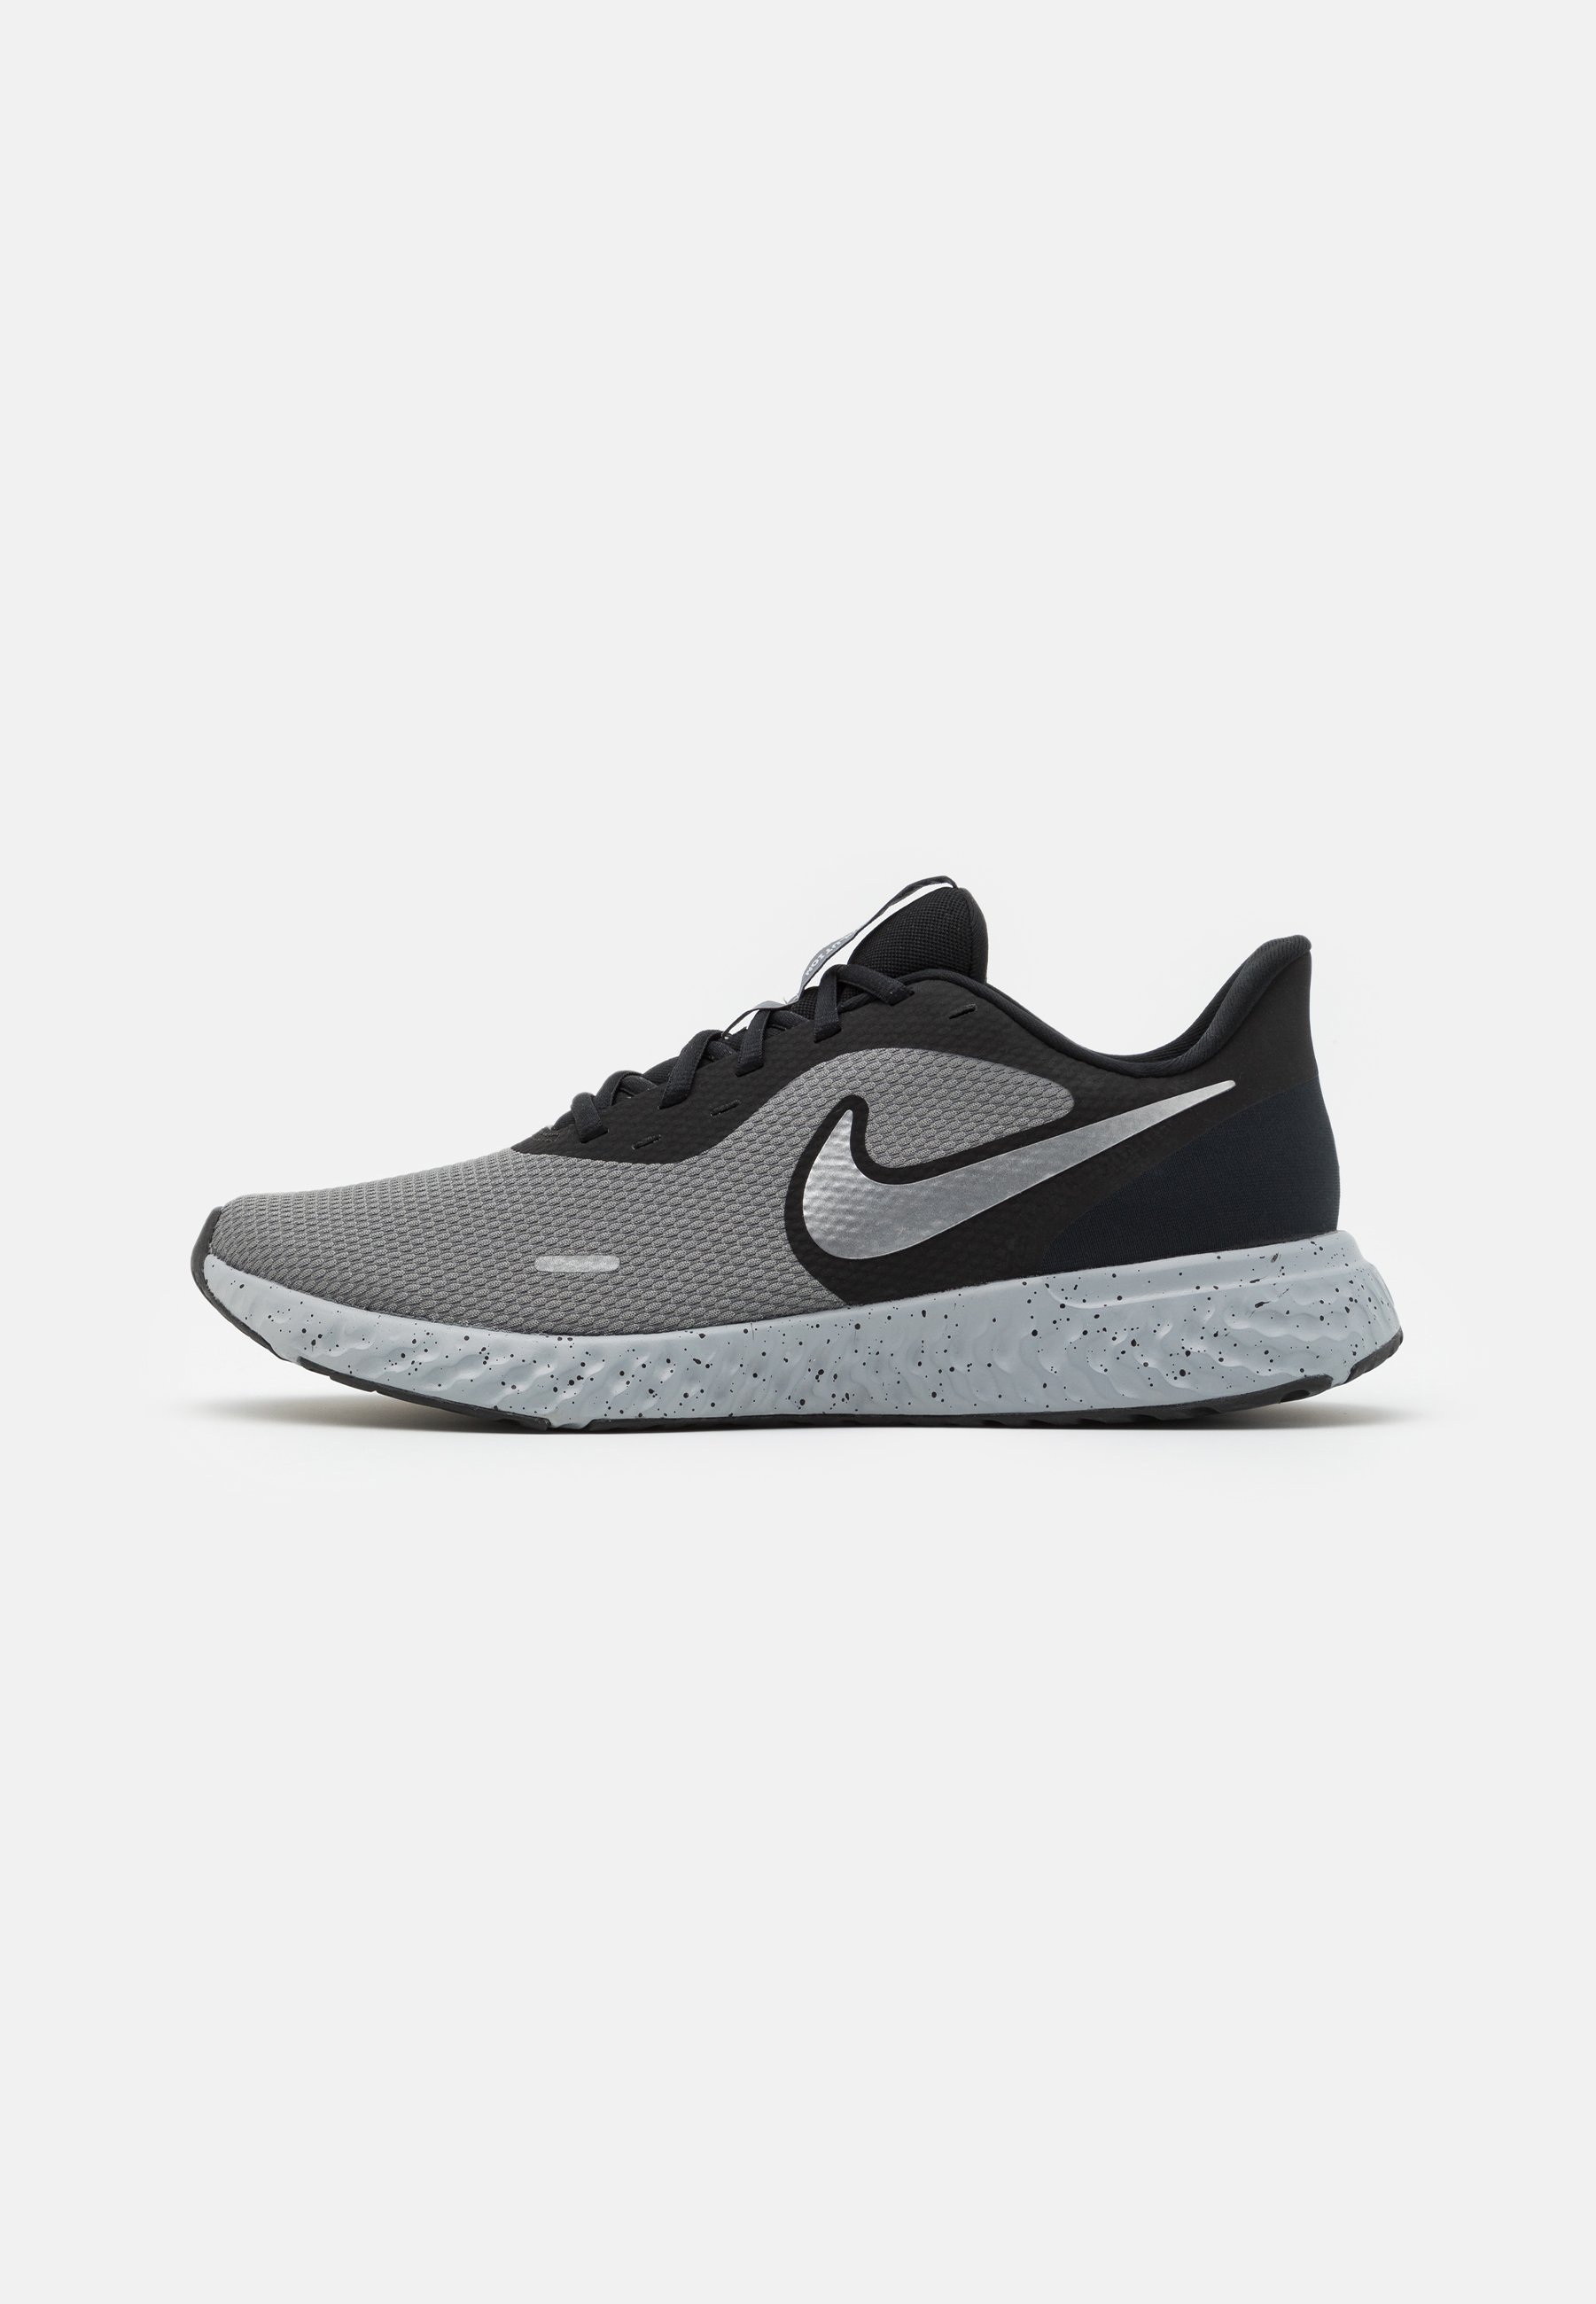 Nike Performance Revolution 5 Prm Neutral Running Shoes Black Chrome Smoke Grey Black Zalando De